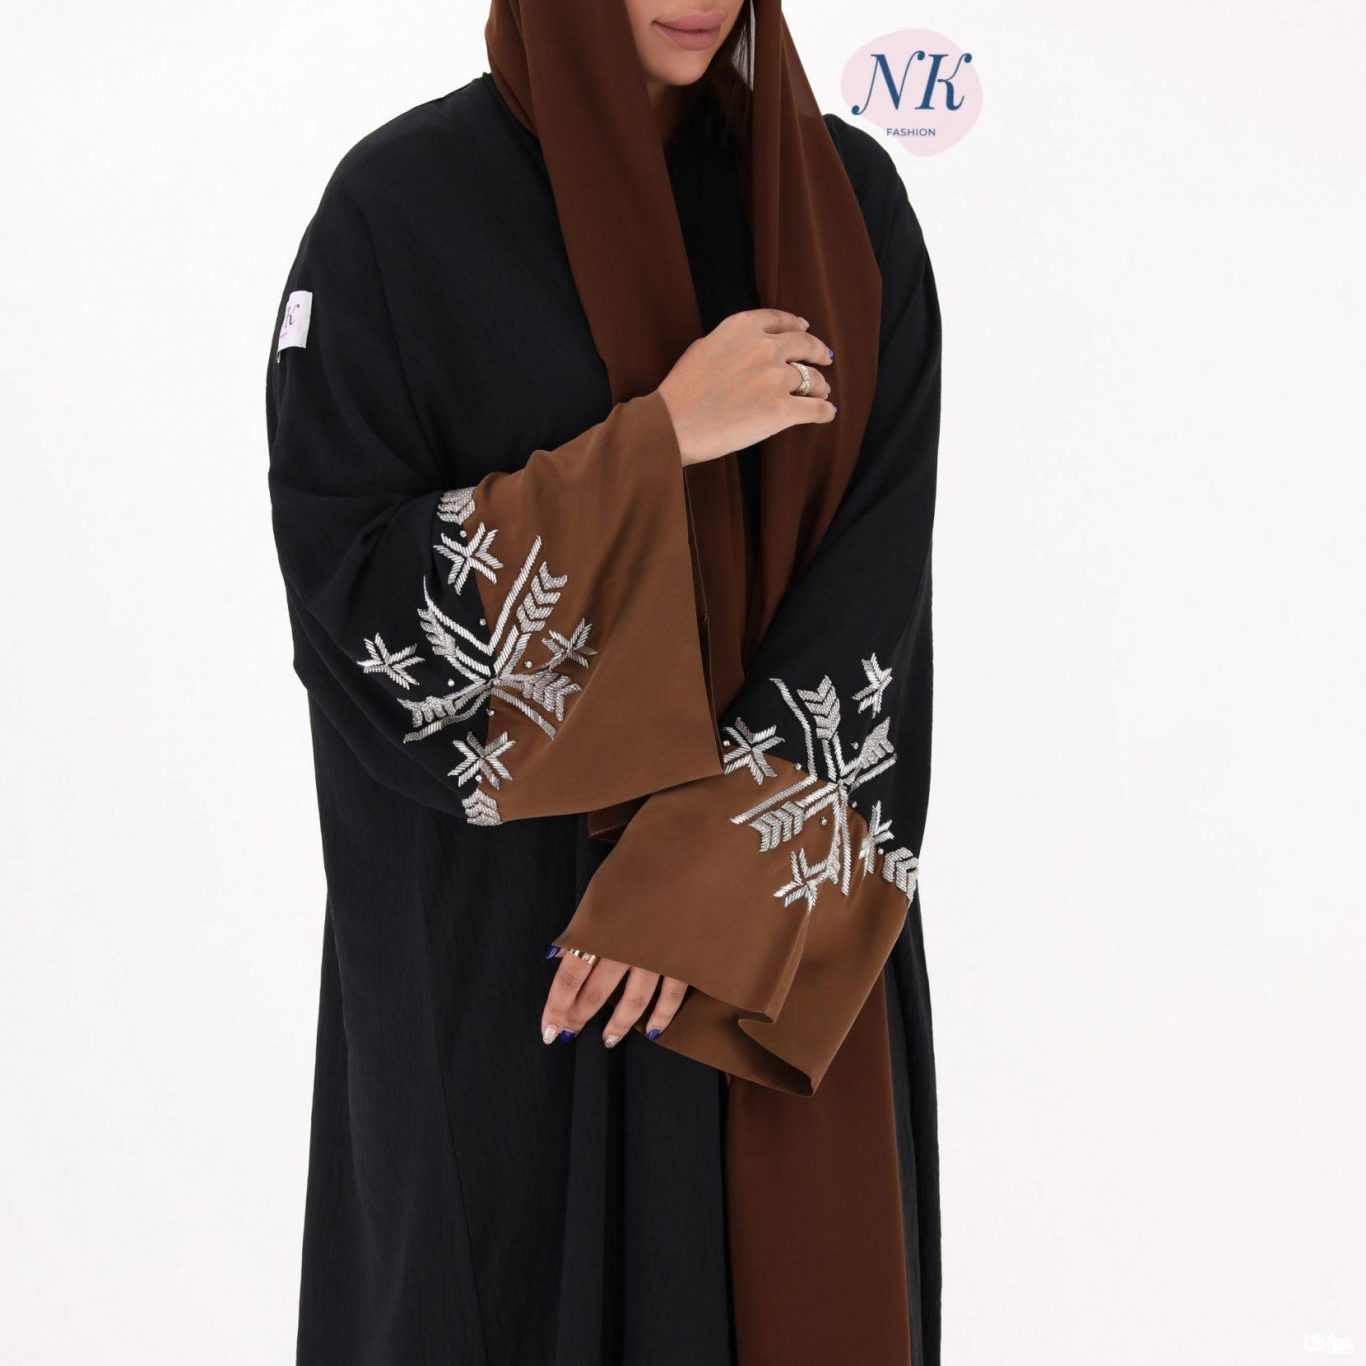 Brown & Black Abaya